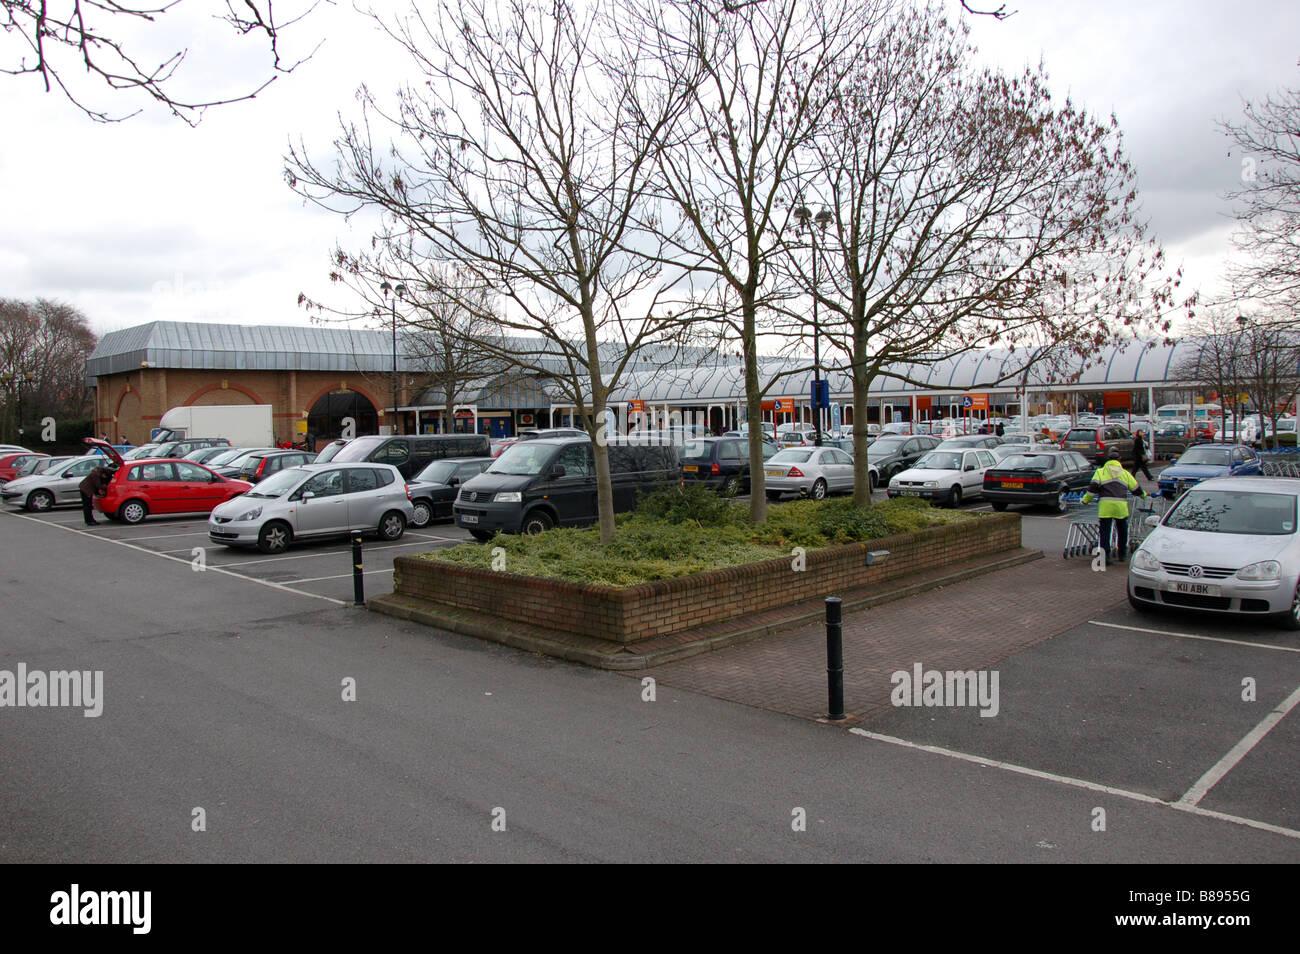 Tesco parking area in Neasen, London, England, Uk - Stock Image